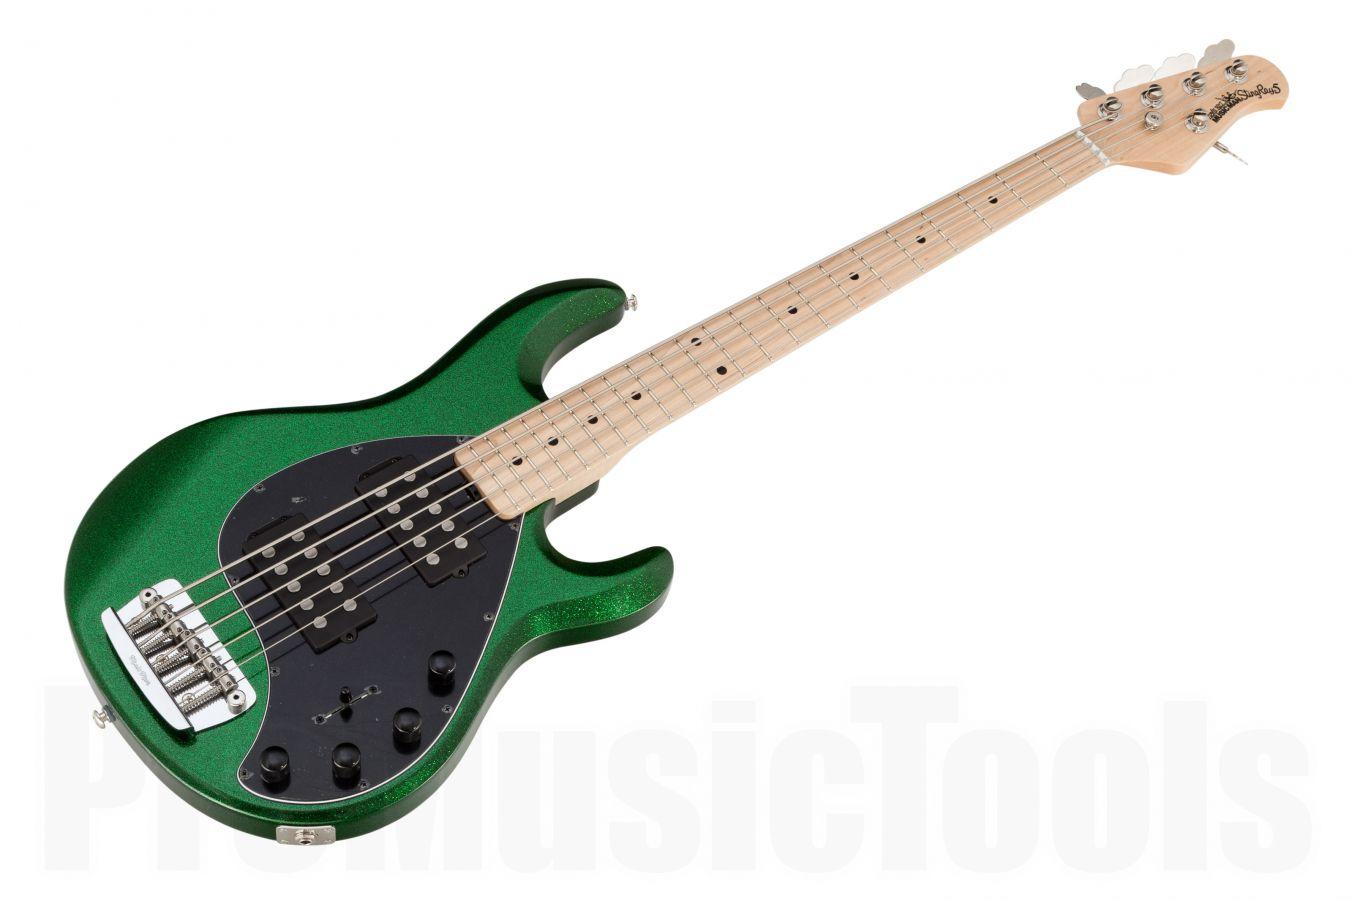 Music Man USA Stingray 5 HH ES - PDN Emerald Green Sparkle Limited Edition MN